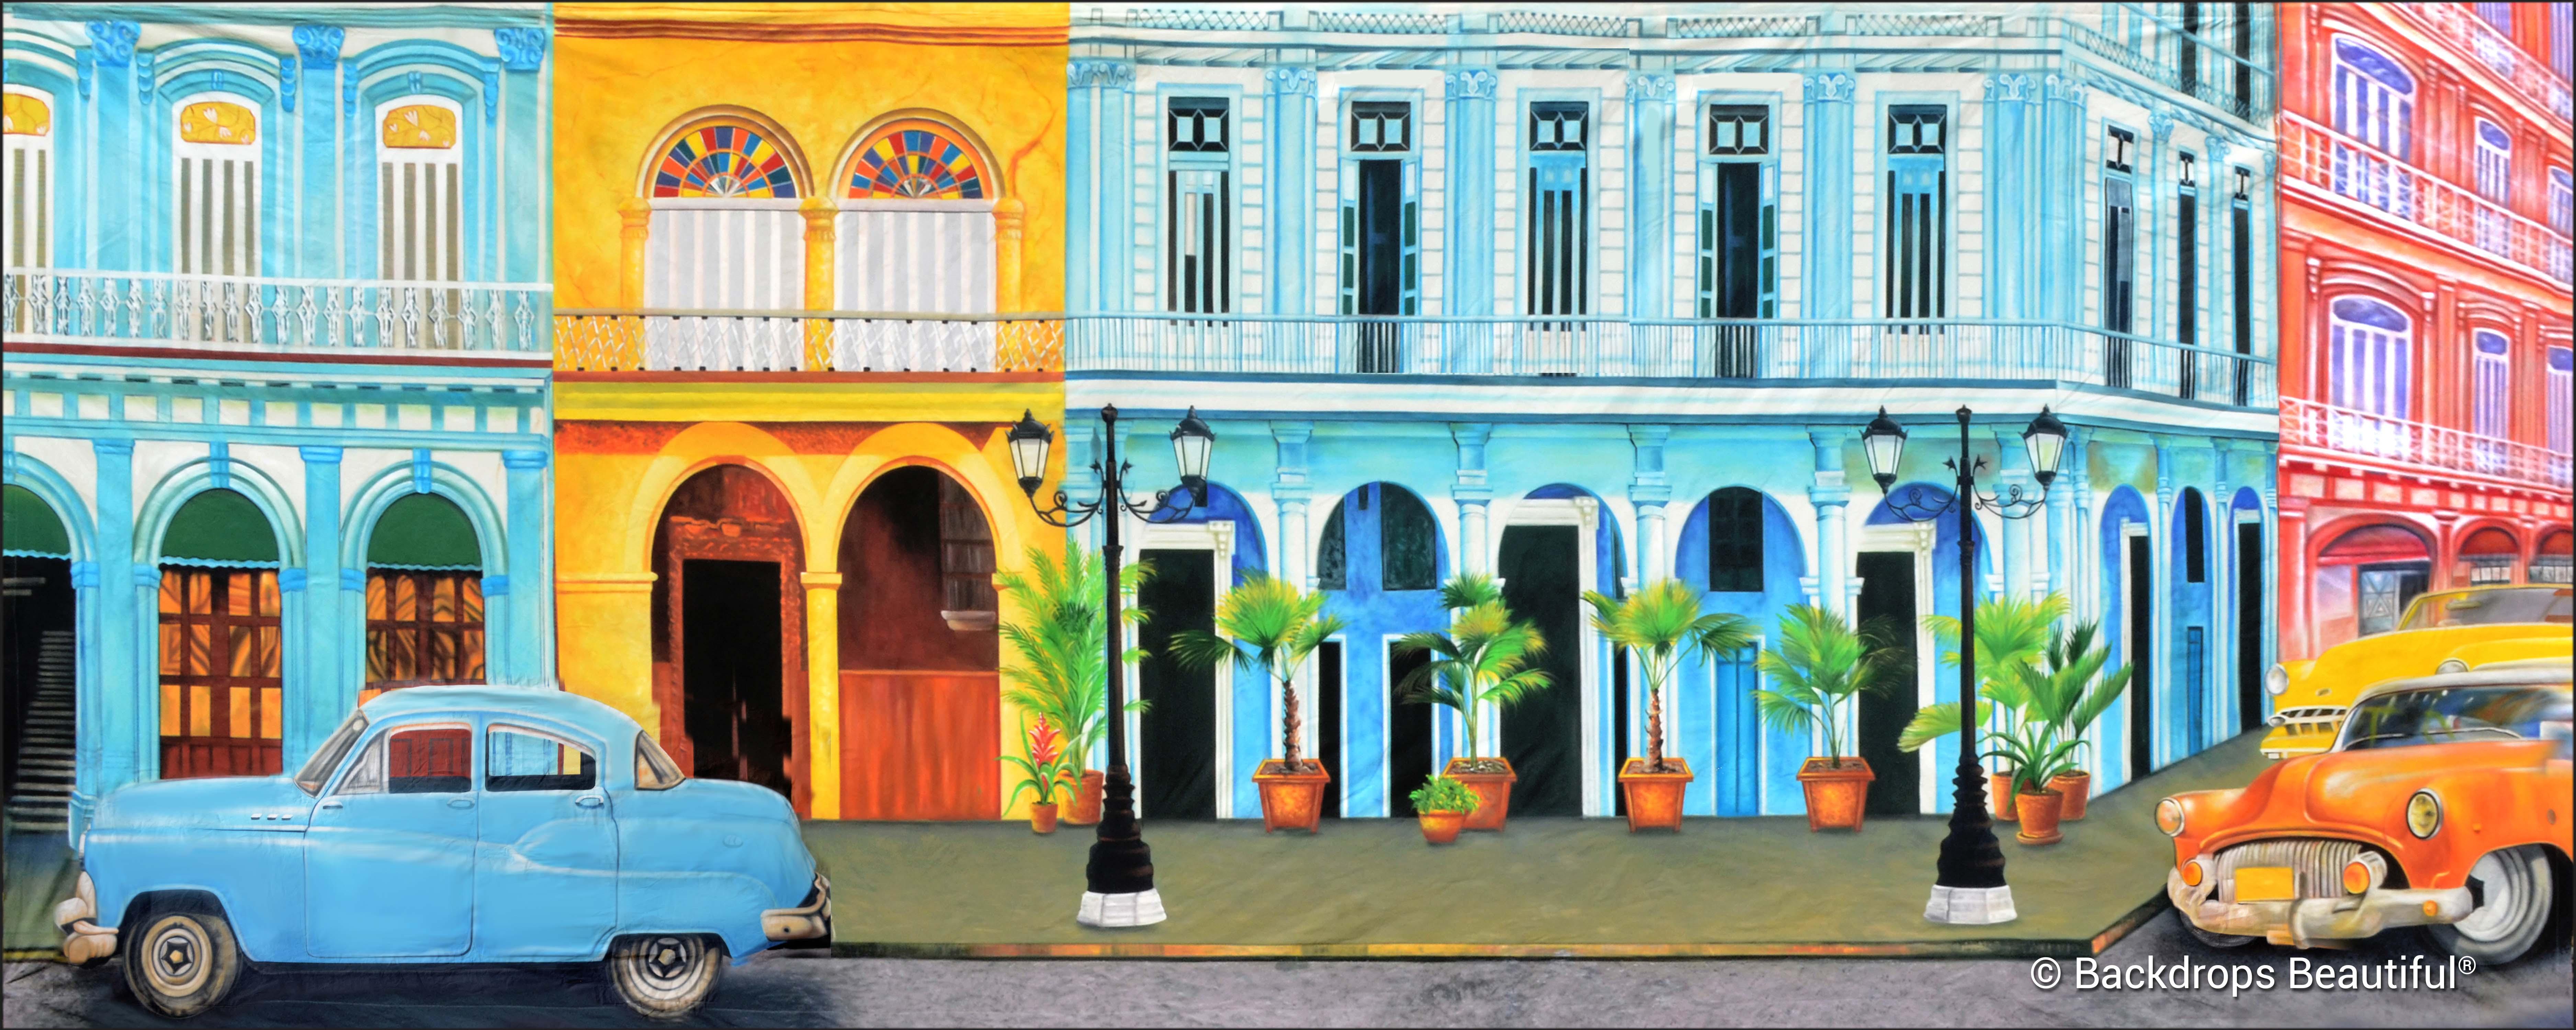 Vivid Scenery - Havana Streets 4